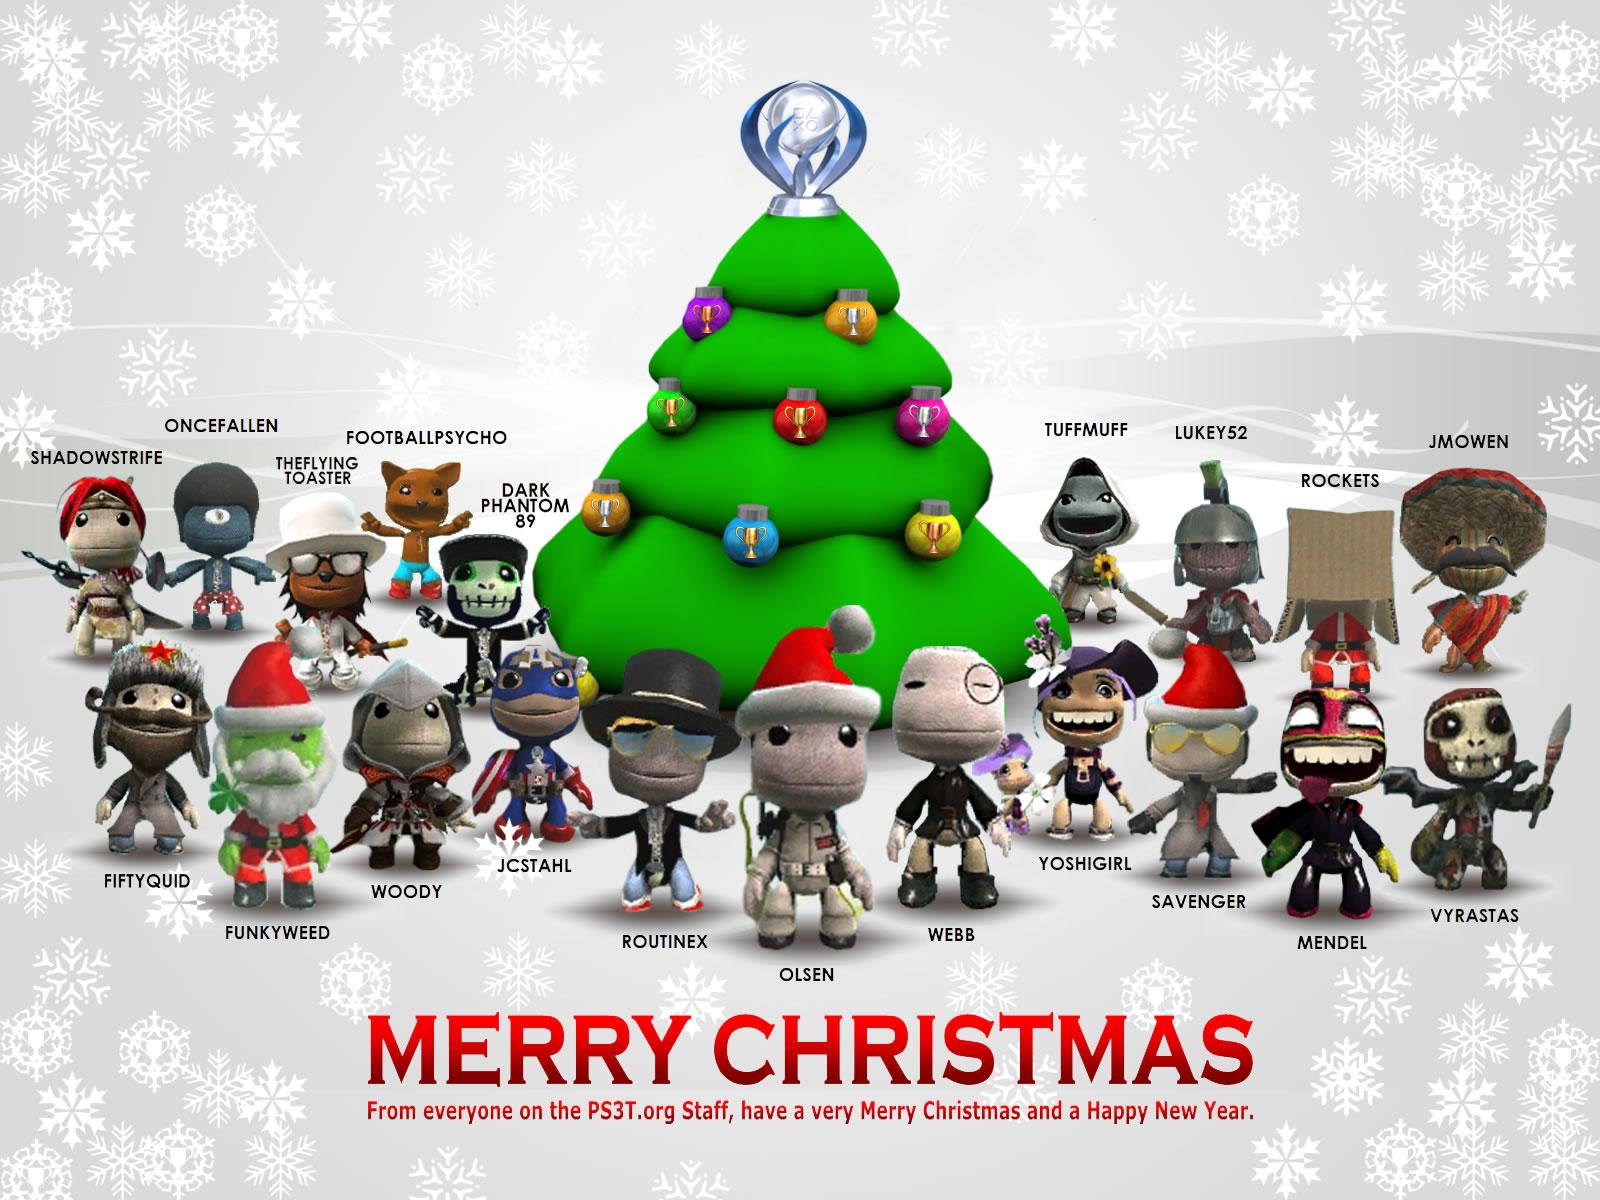 Merry Christmas!! - Playstation 4, PlayStation 3 News at ...